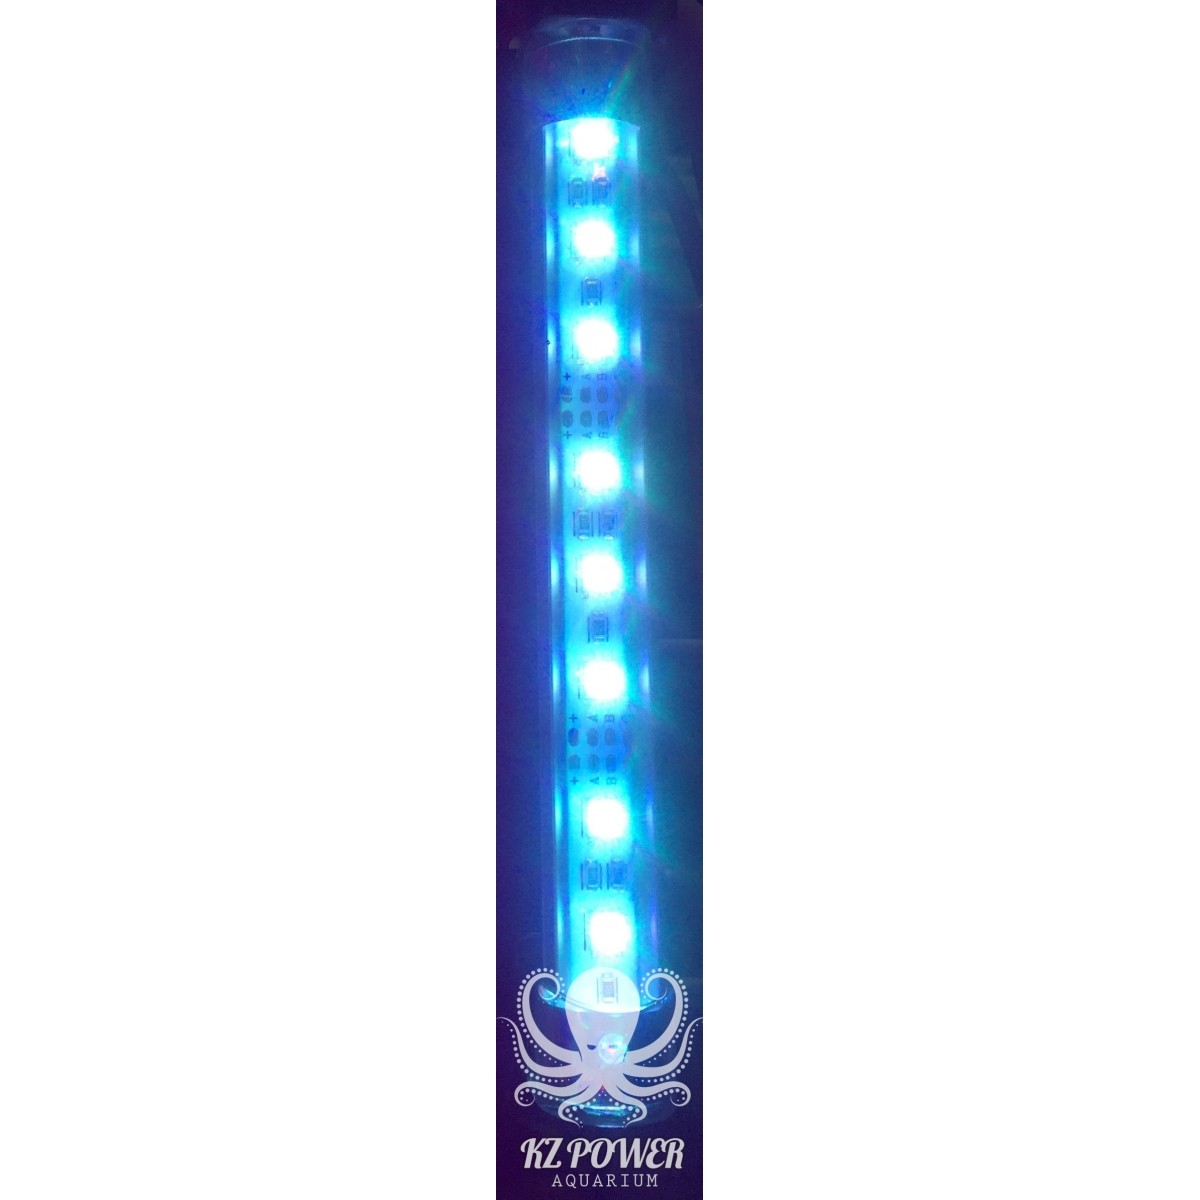 Luminaria Led Aqualumi RGB 65cm + Fonte Bivolt  - KZ Power